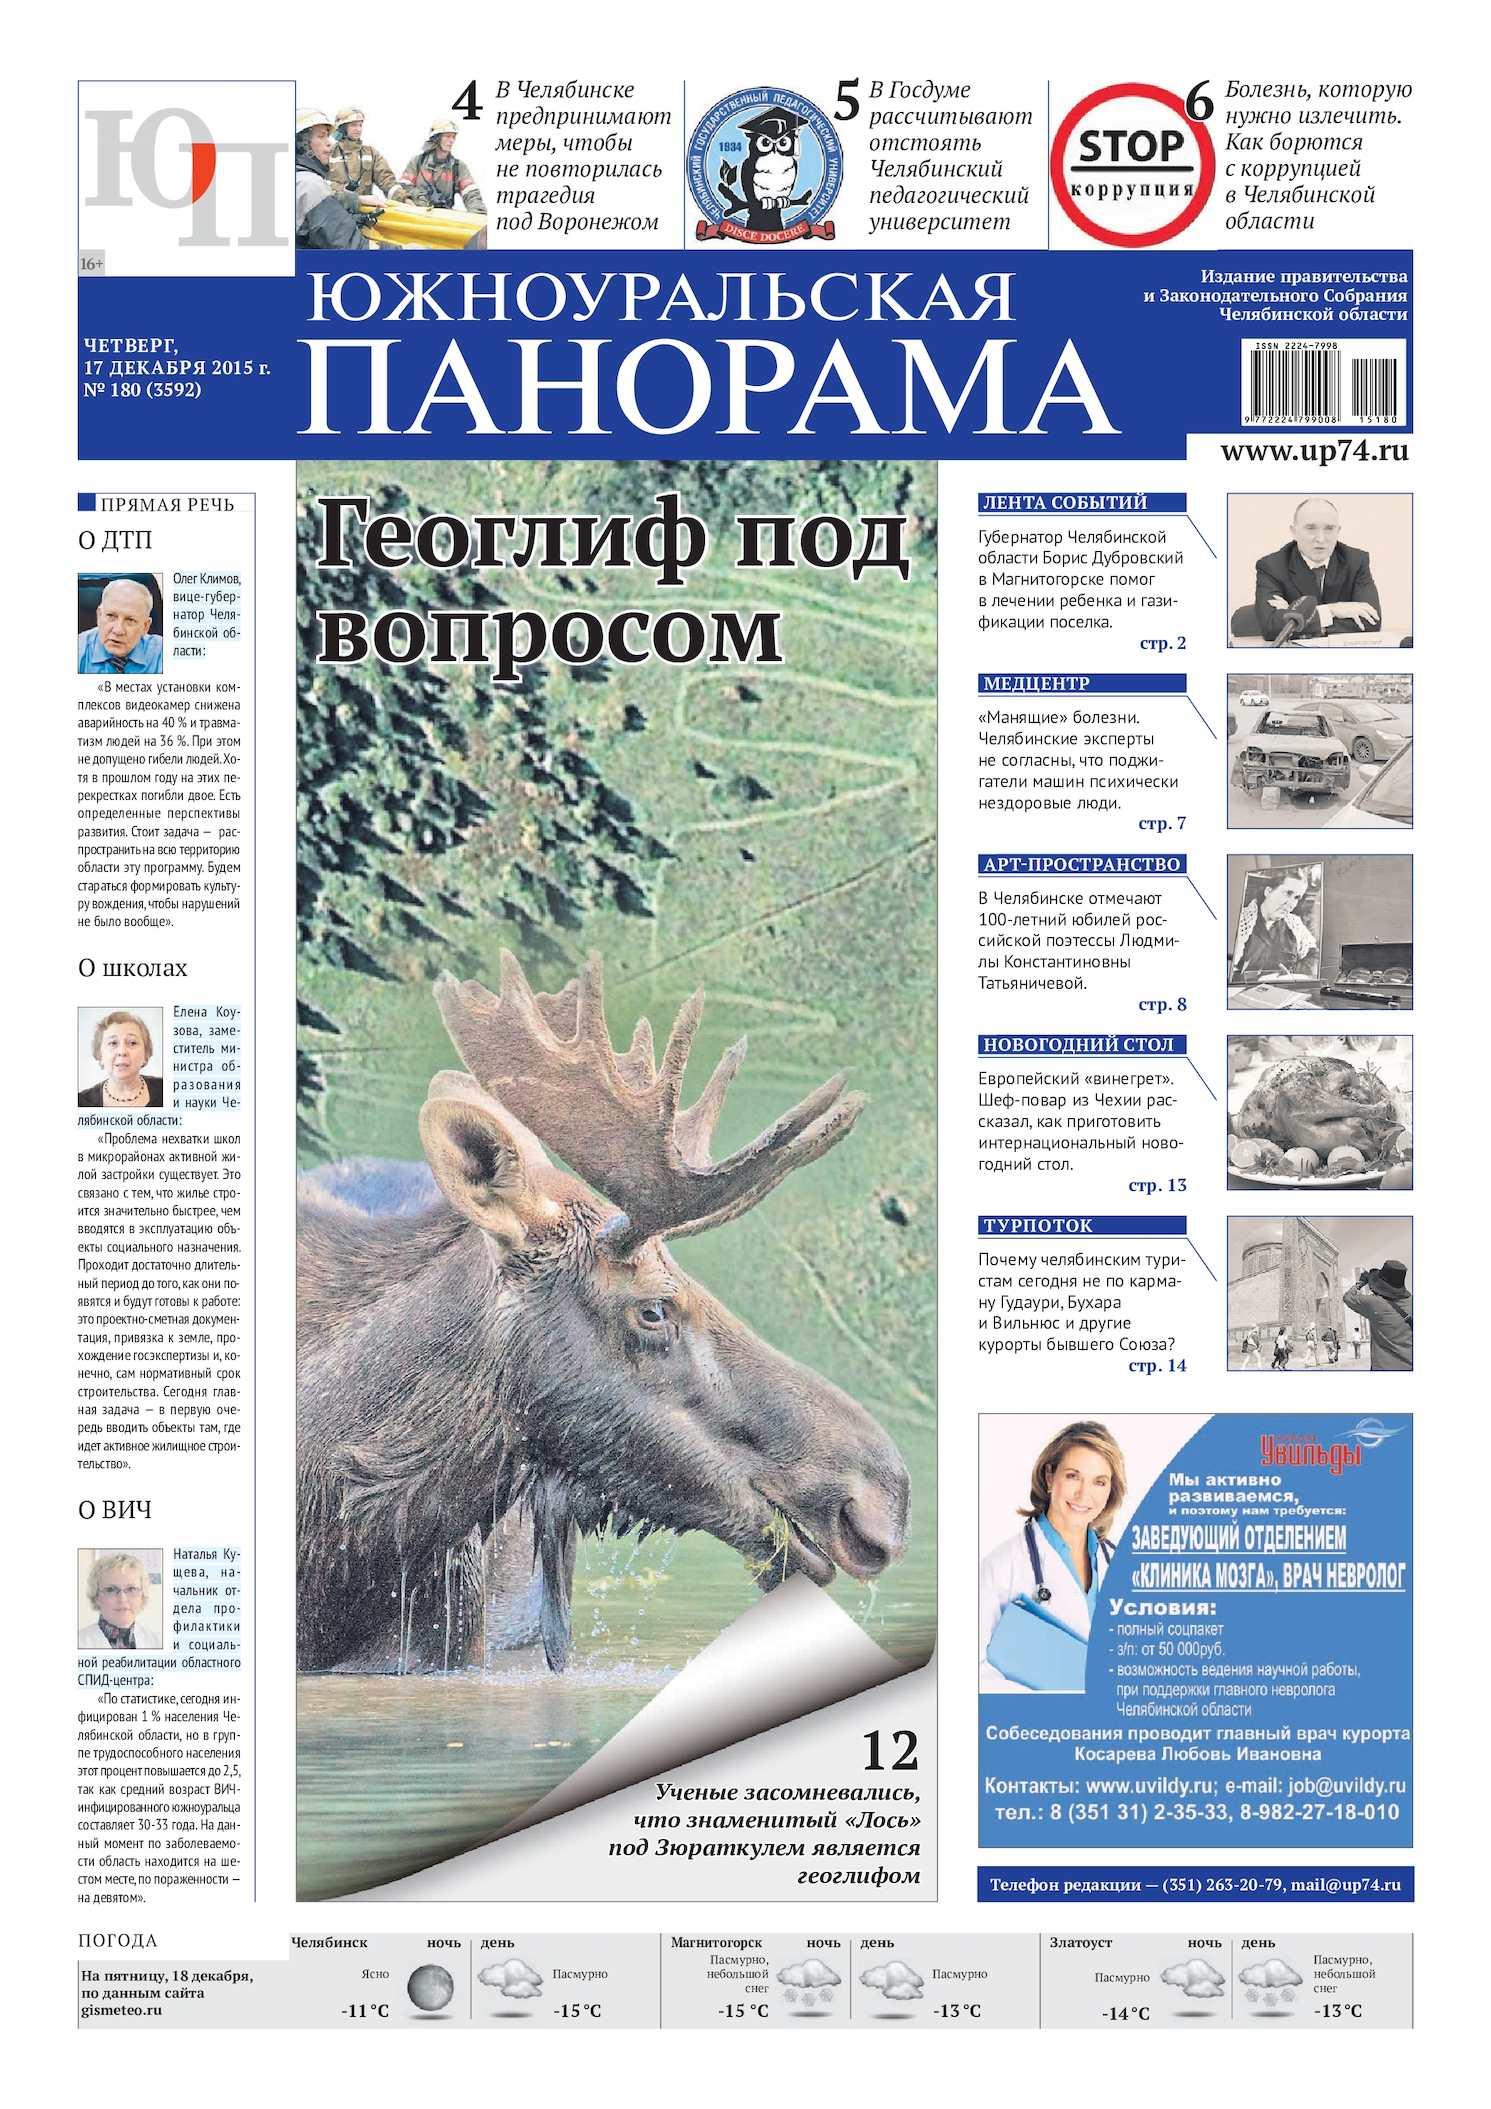 tur v greciju neponyatnyj kurort 16 753 rub chel - Тур в Грецию непонятный курорт 16 753 руб. чел.